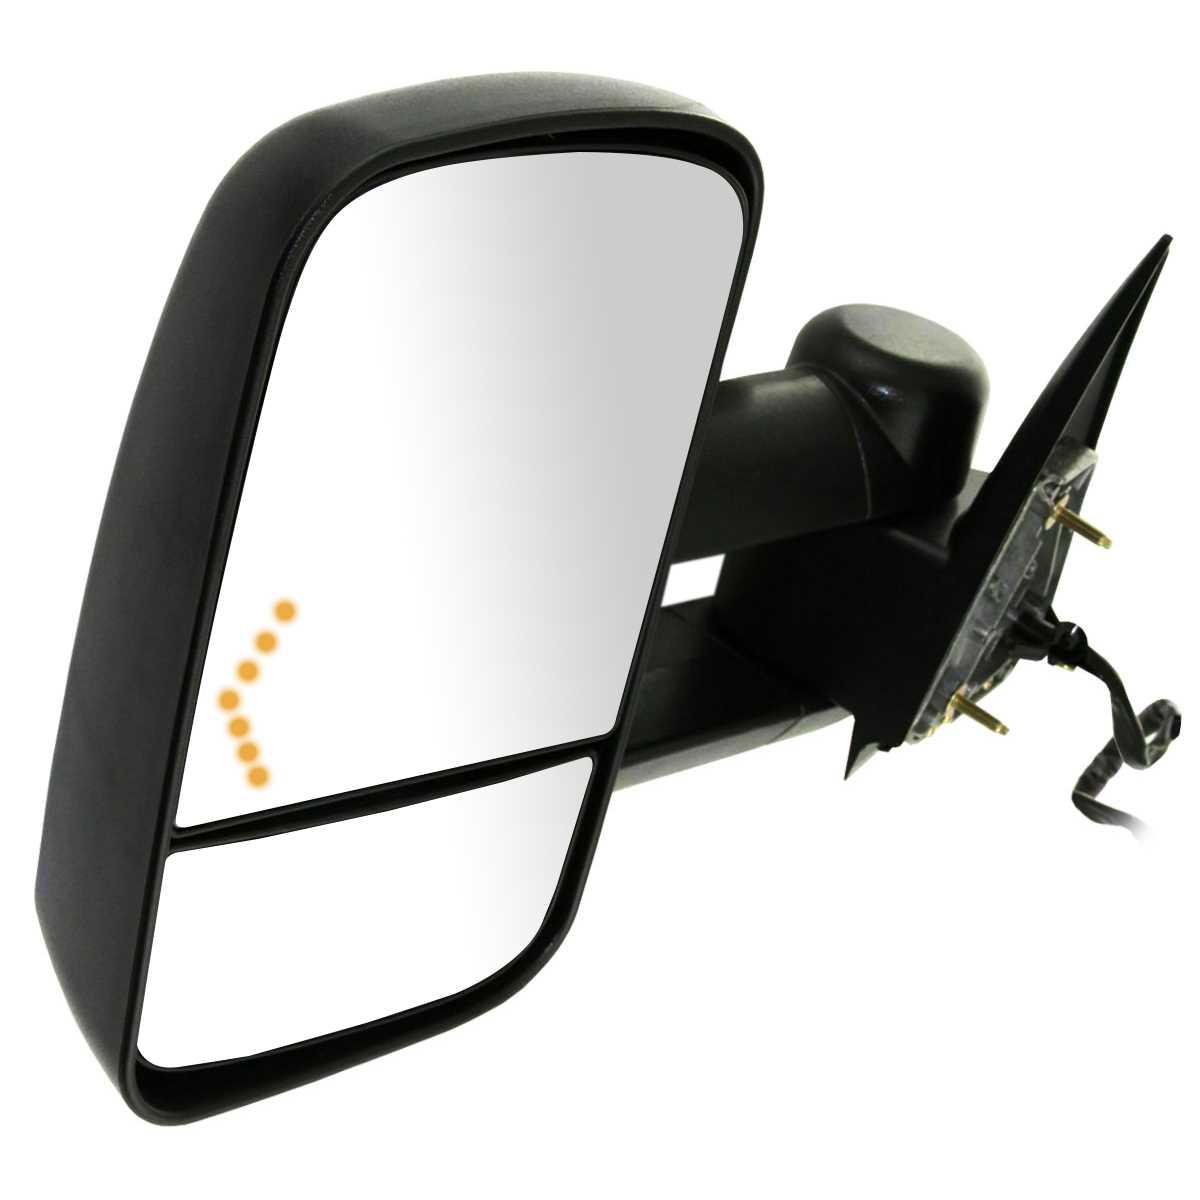 New-Pair-Power-Heated-Signal-Side-Mirror-Fits-2003-2006-Chevrolet-Silverado-1500 thumbnail 3